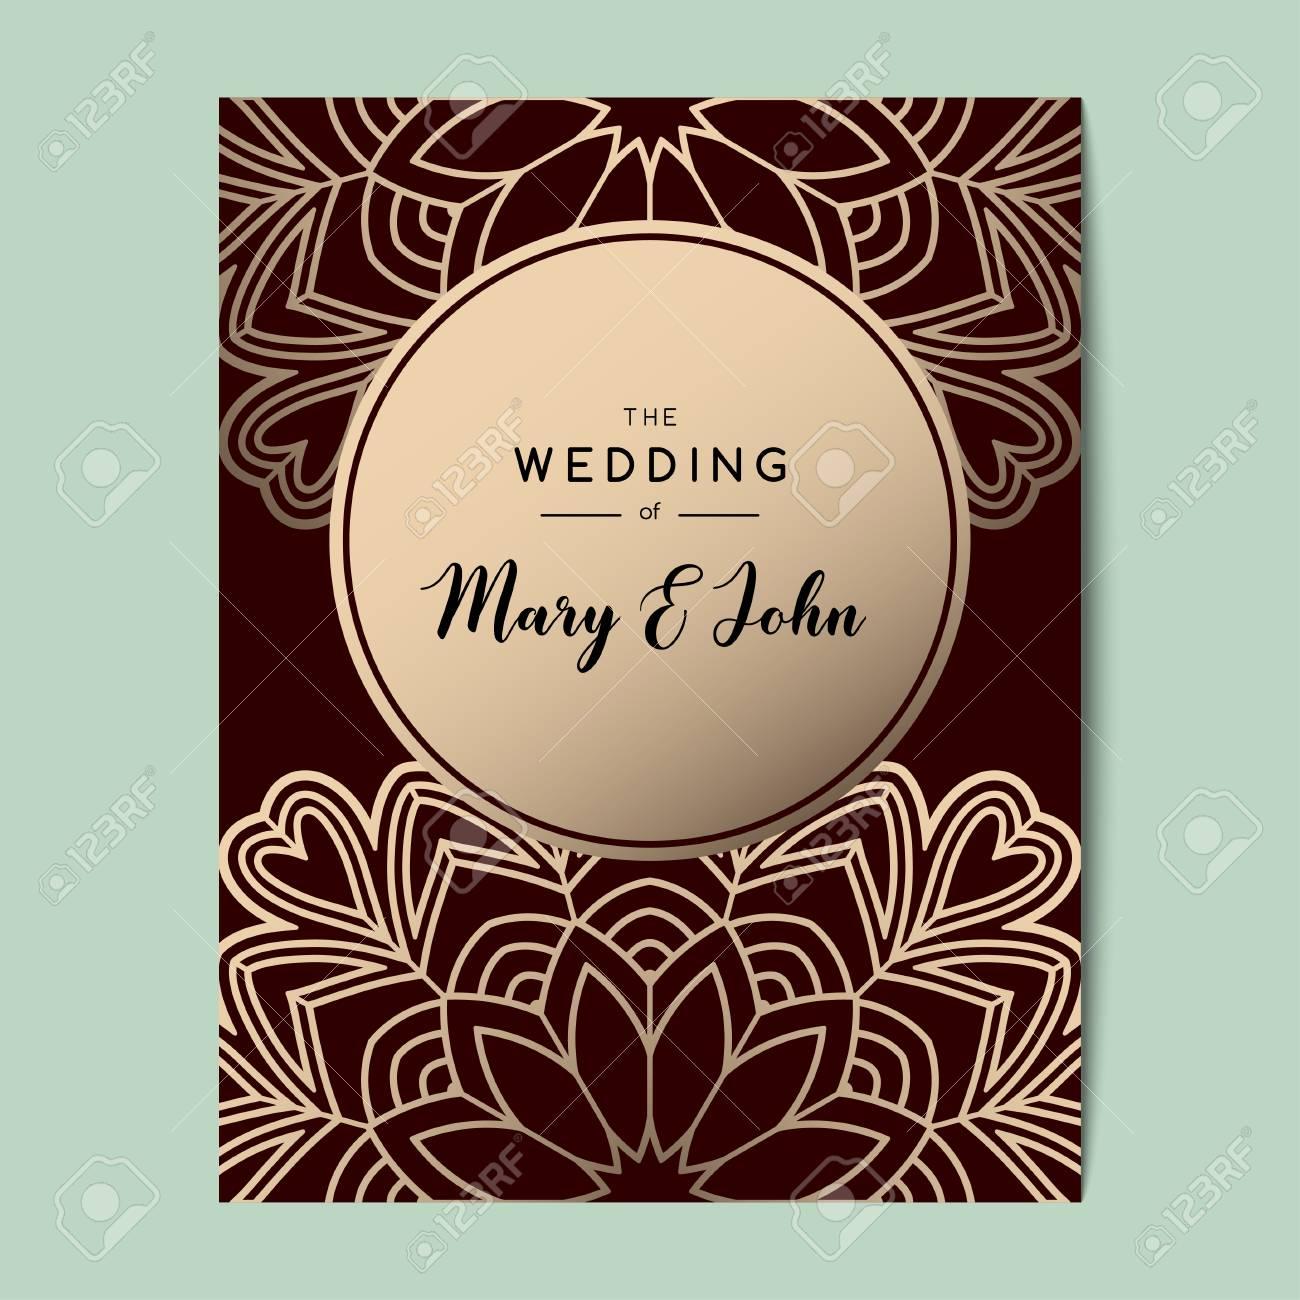 elegant wedding invitation background card design with floral